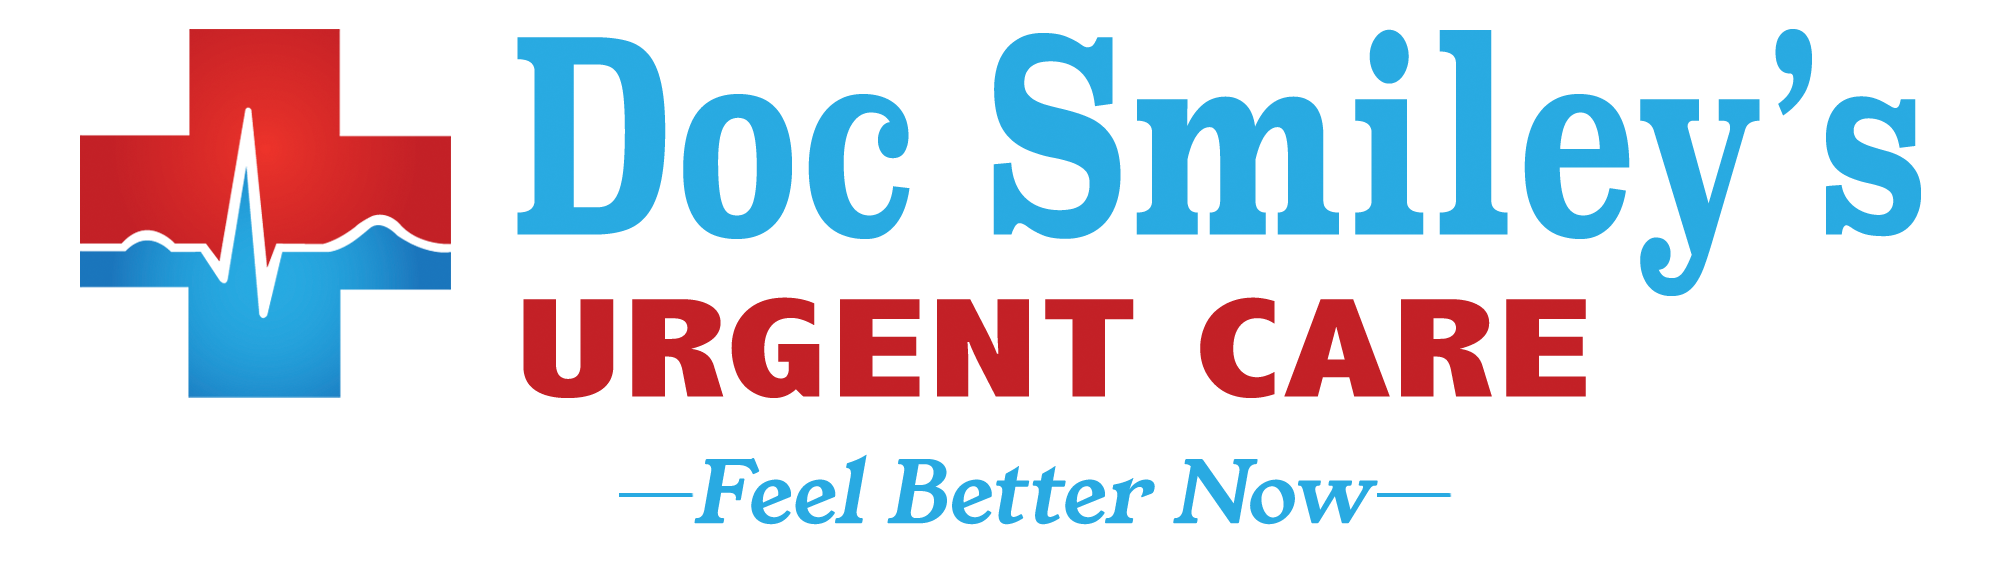 Doc Smiley's Urgent Care